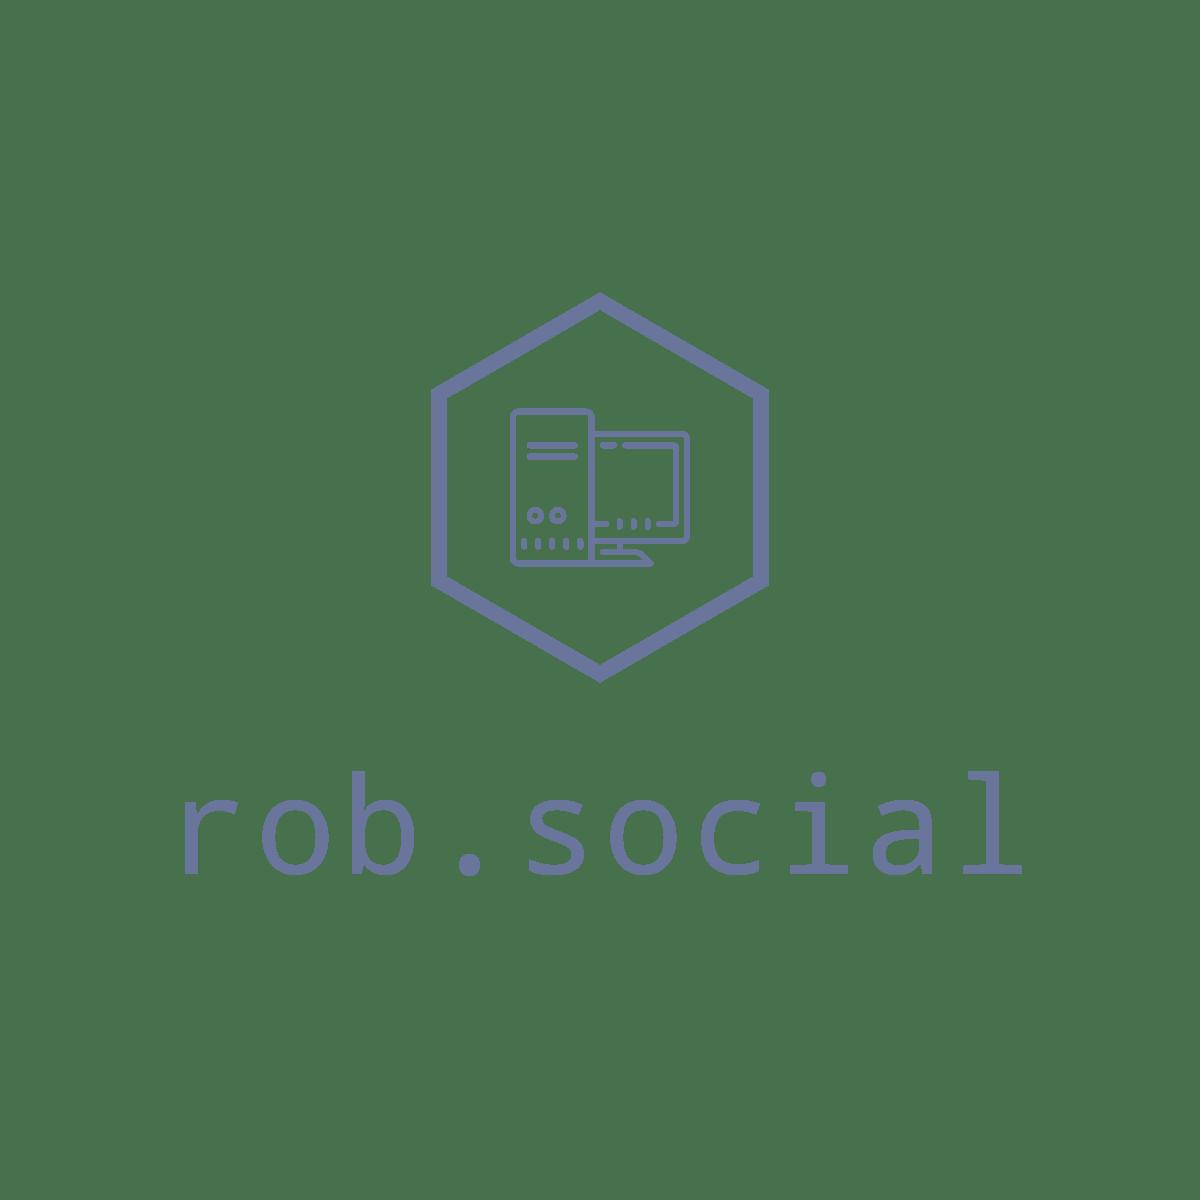 rob.social logo